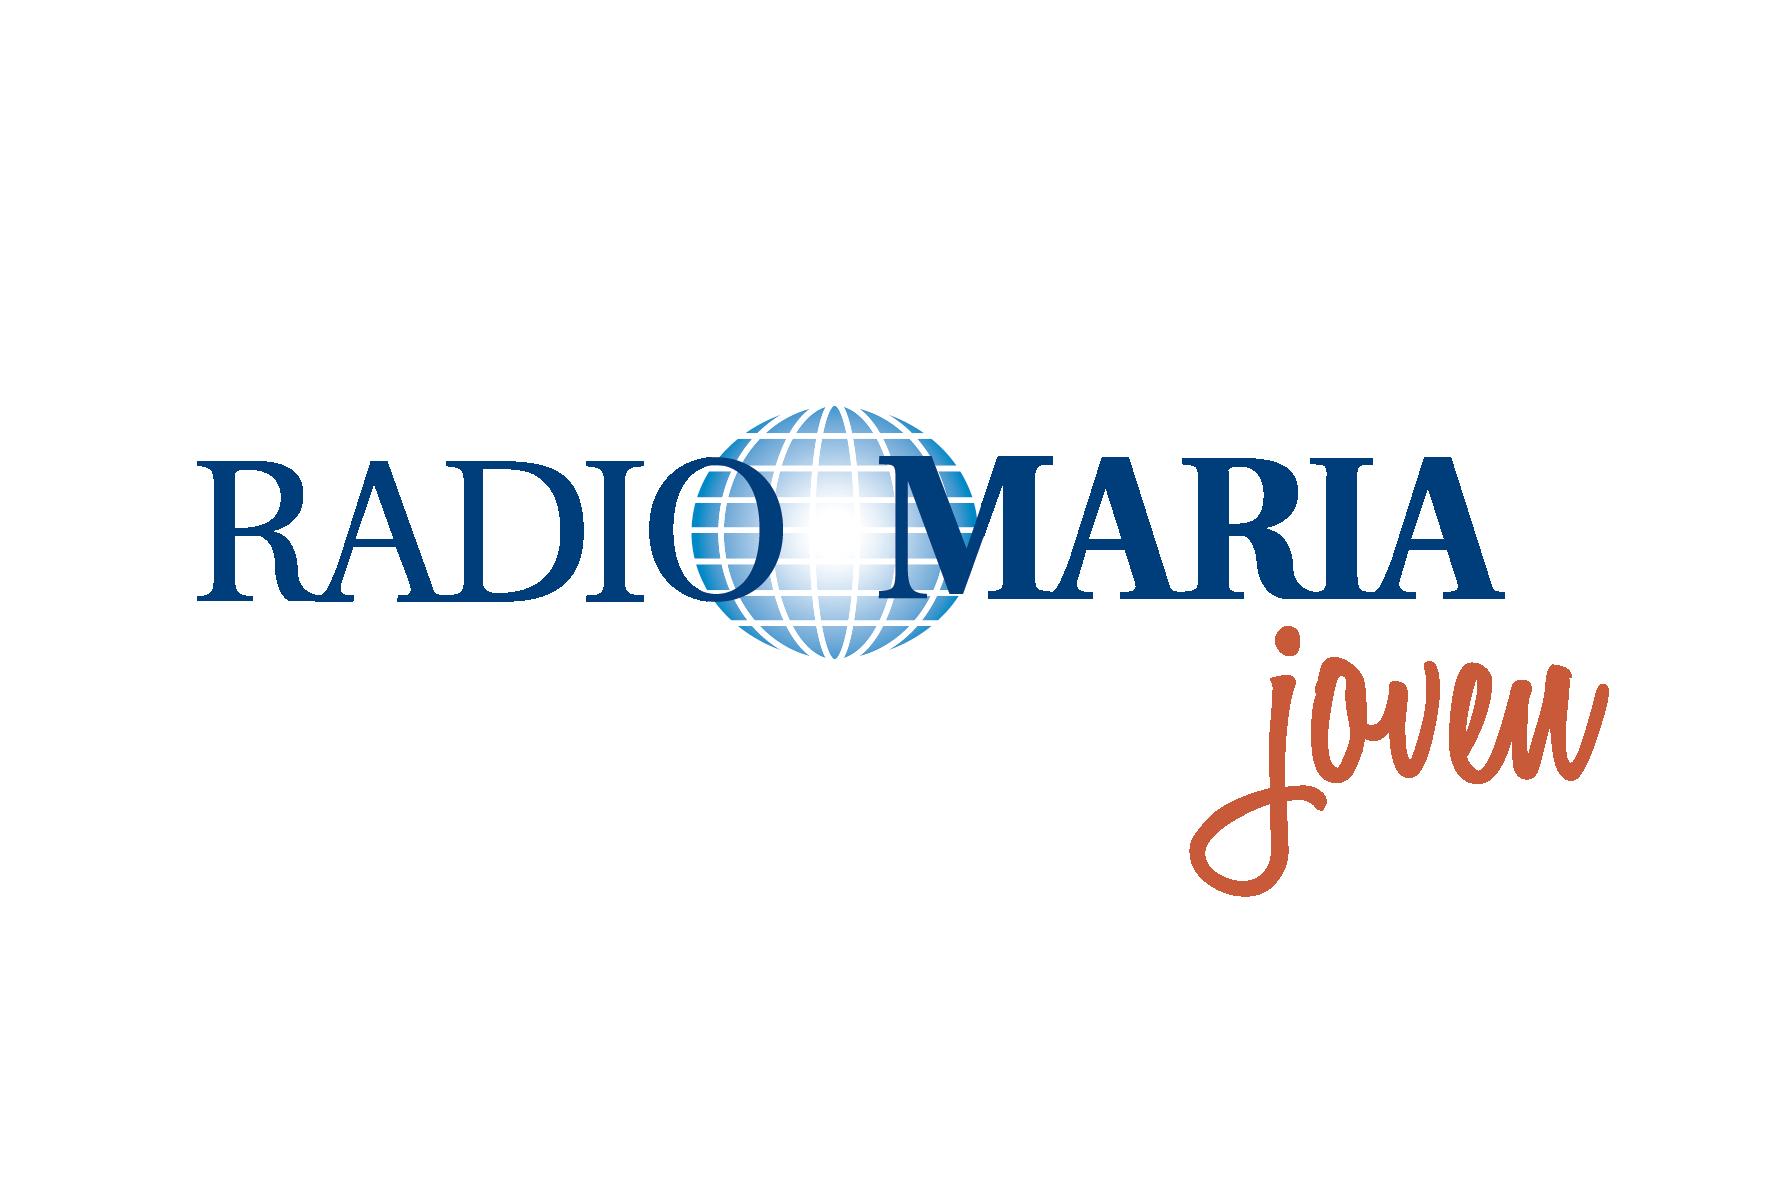 Radio Maria Joven